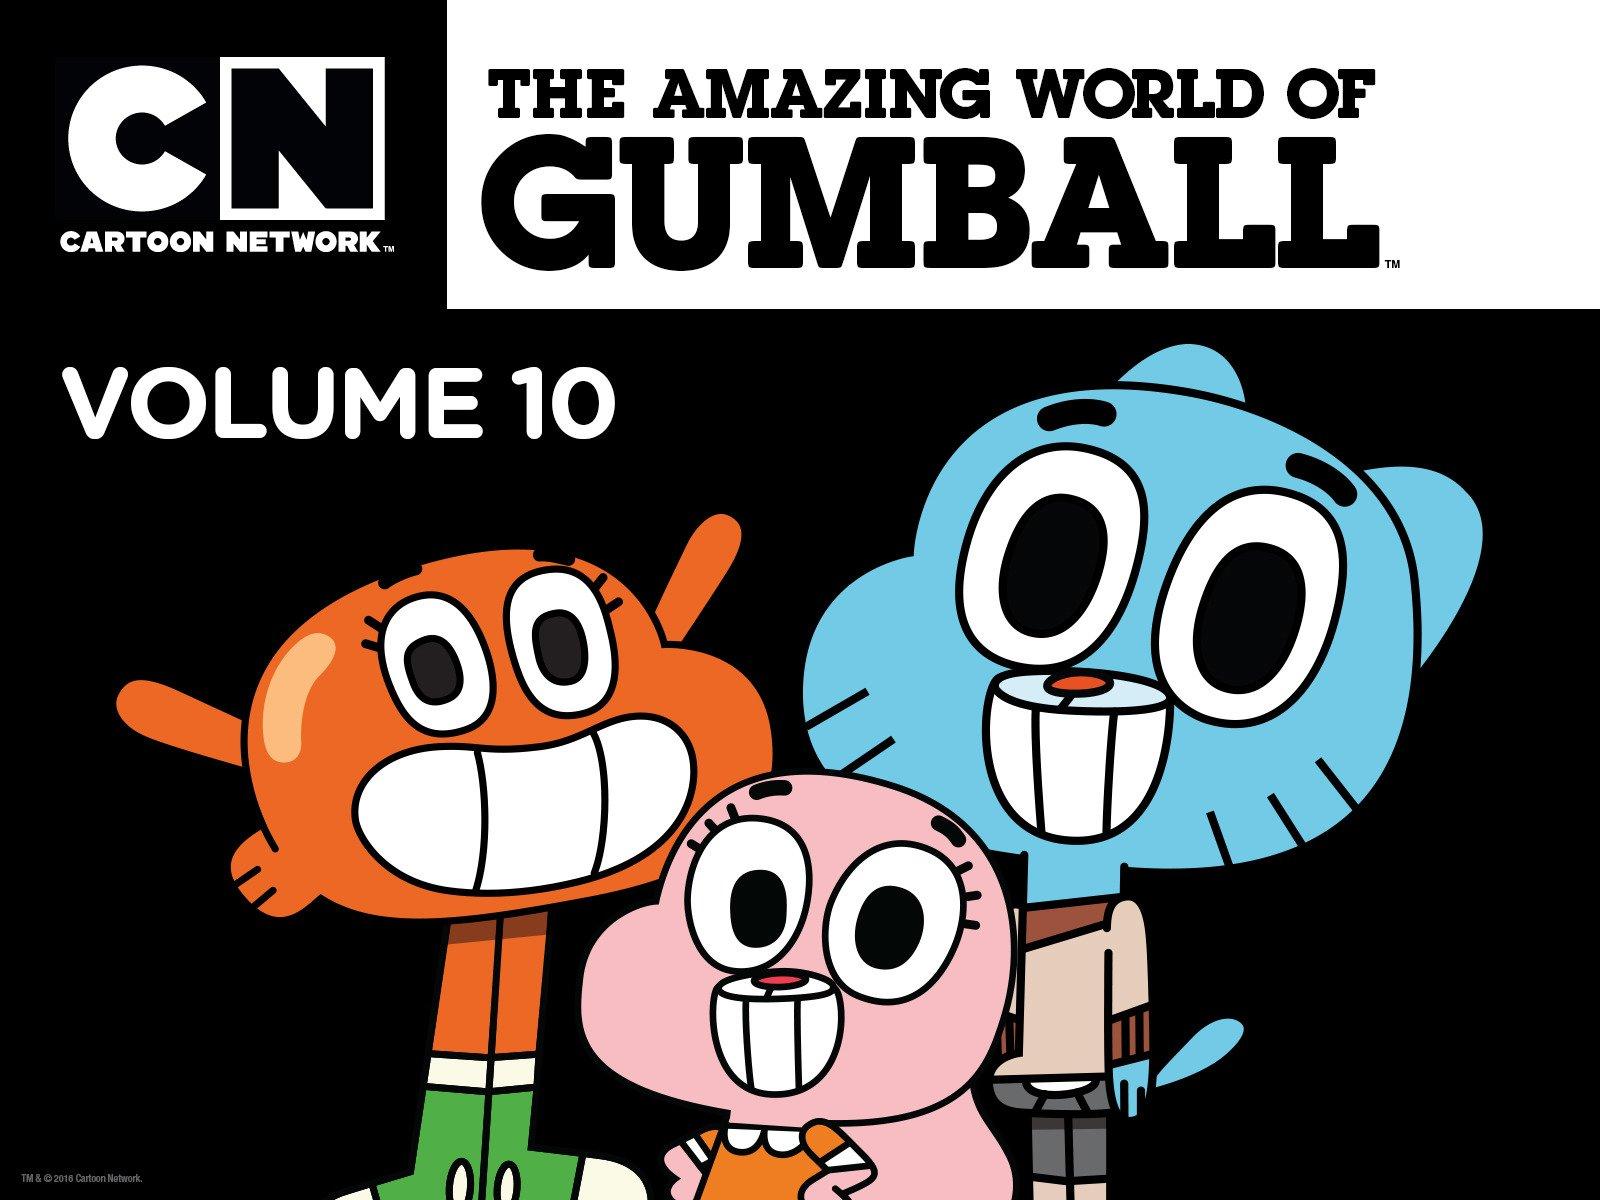 The Joy The Amazing World Of Gumball